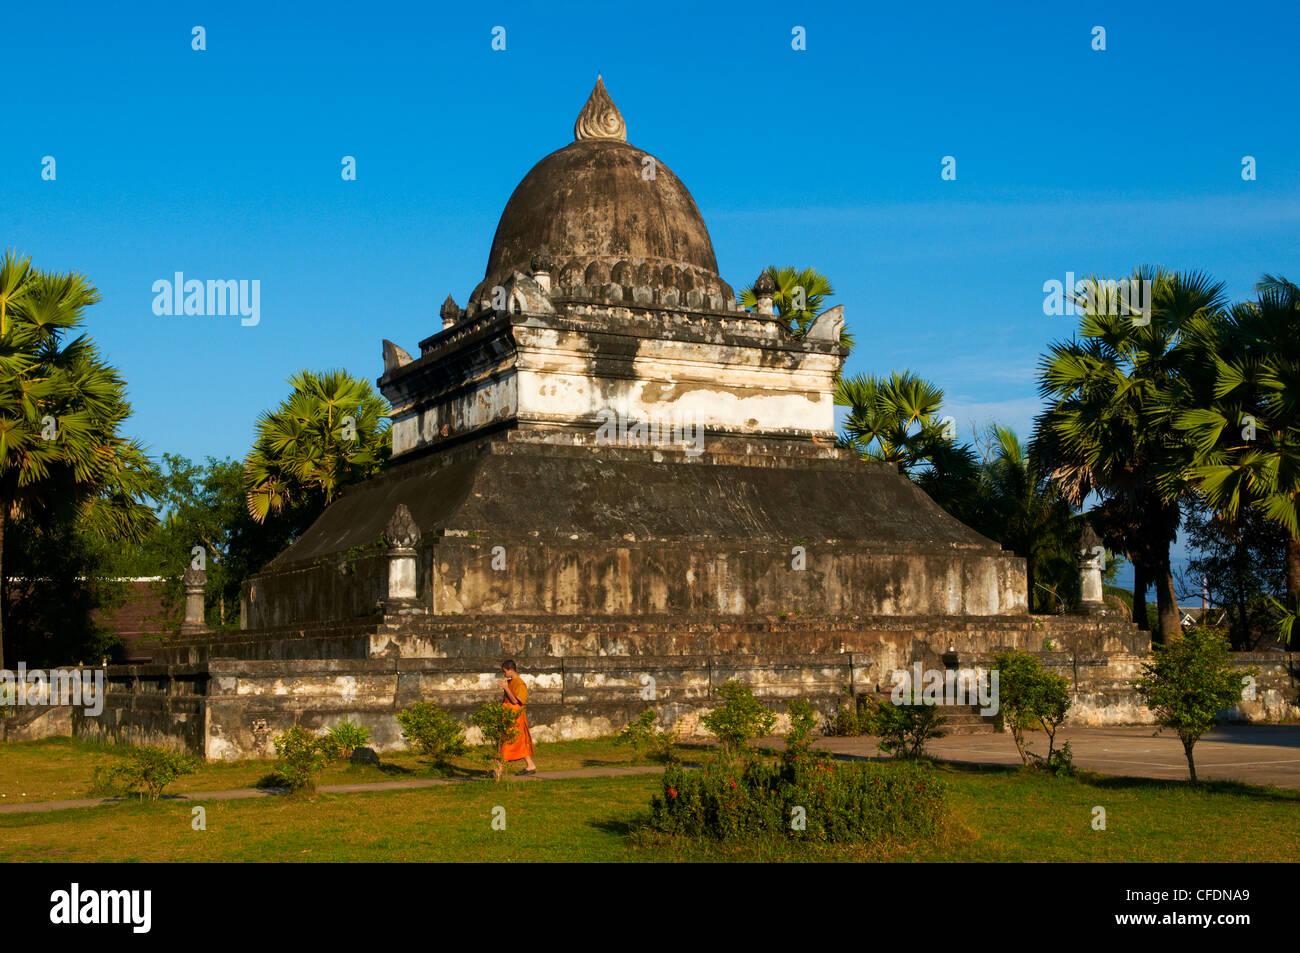 Vat Aham Luang Prabang UNESCO World Heritage Site Laos Indochina Stock Ph